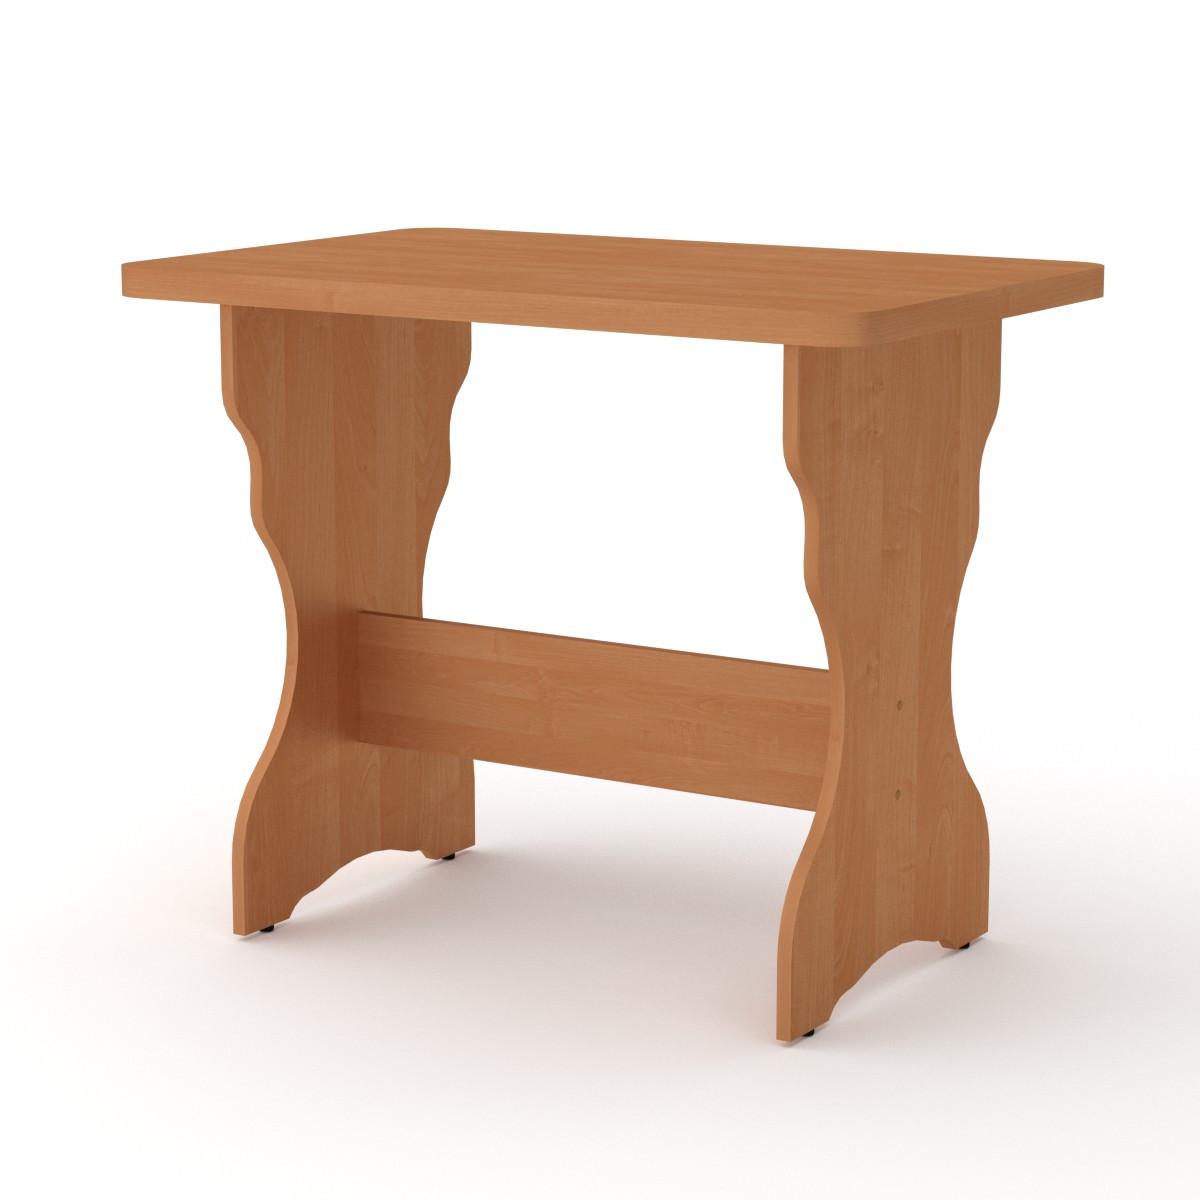 Стол кухонный КС-3 яблоня Компанит (90х59х73 см), фото 8